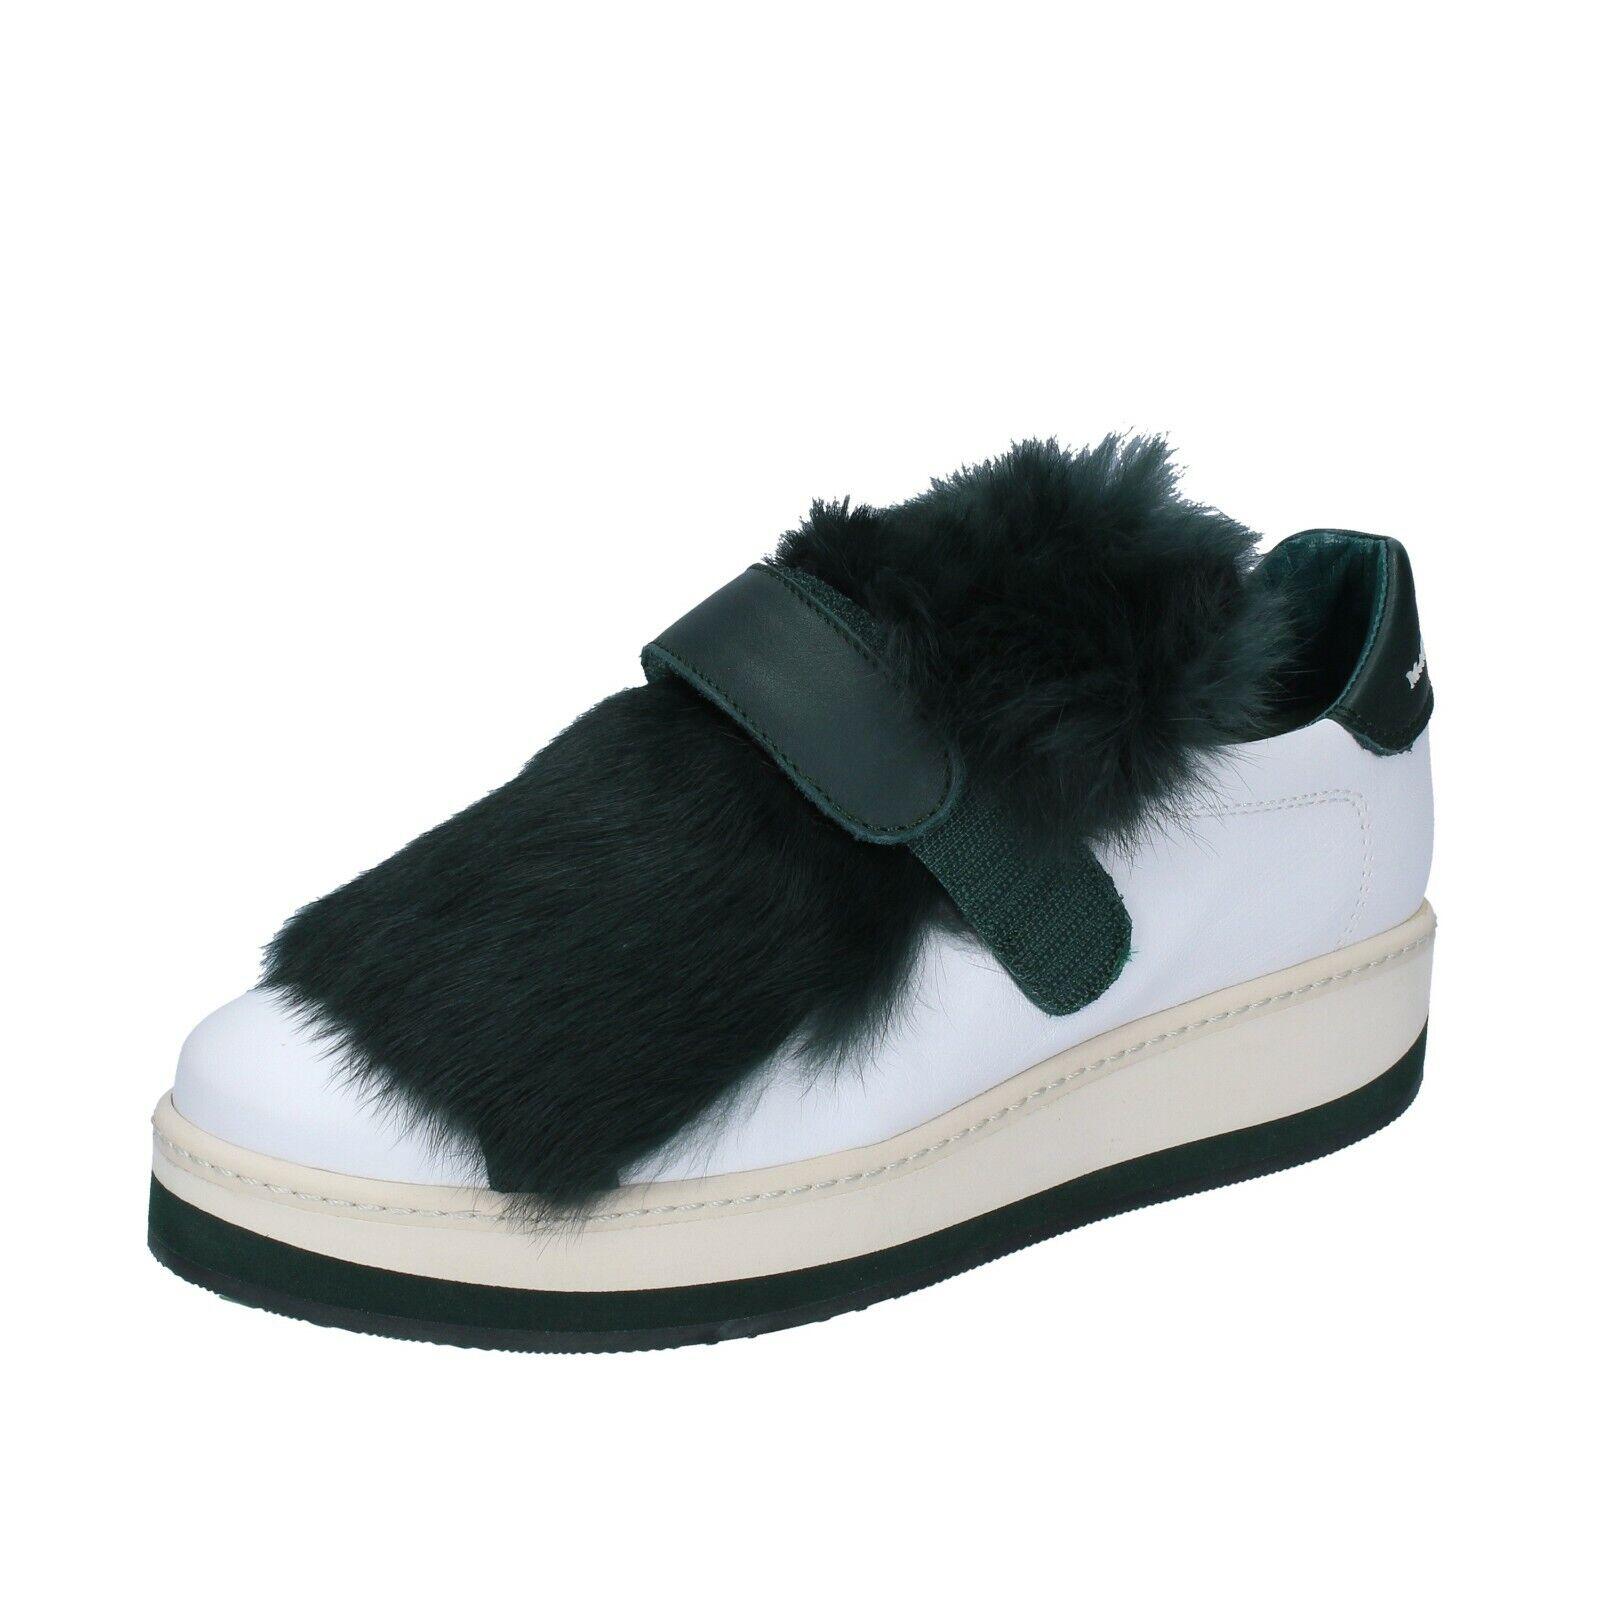 Scarpe donna MANUEL BARCELO 36 EU scarpe da ginnastica bianco verde pelle BS331-36